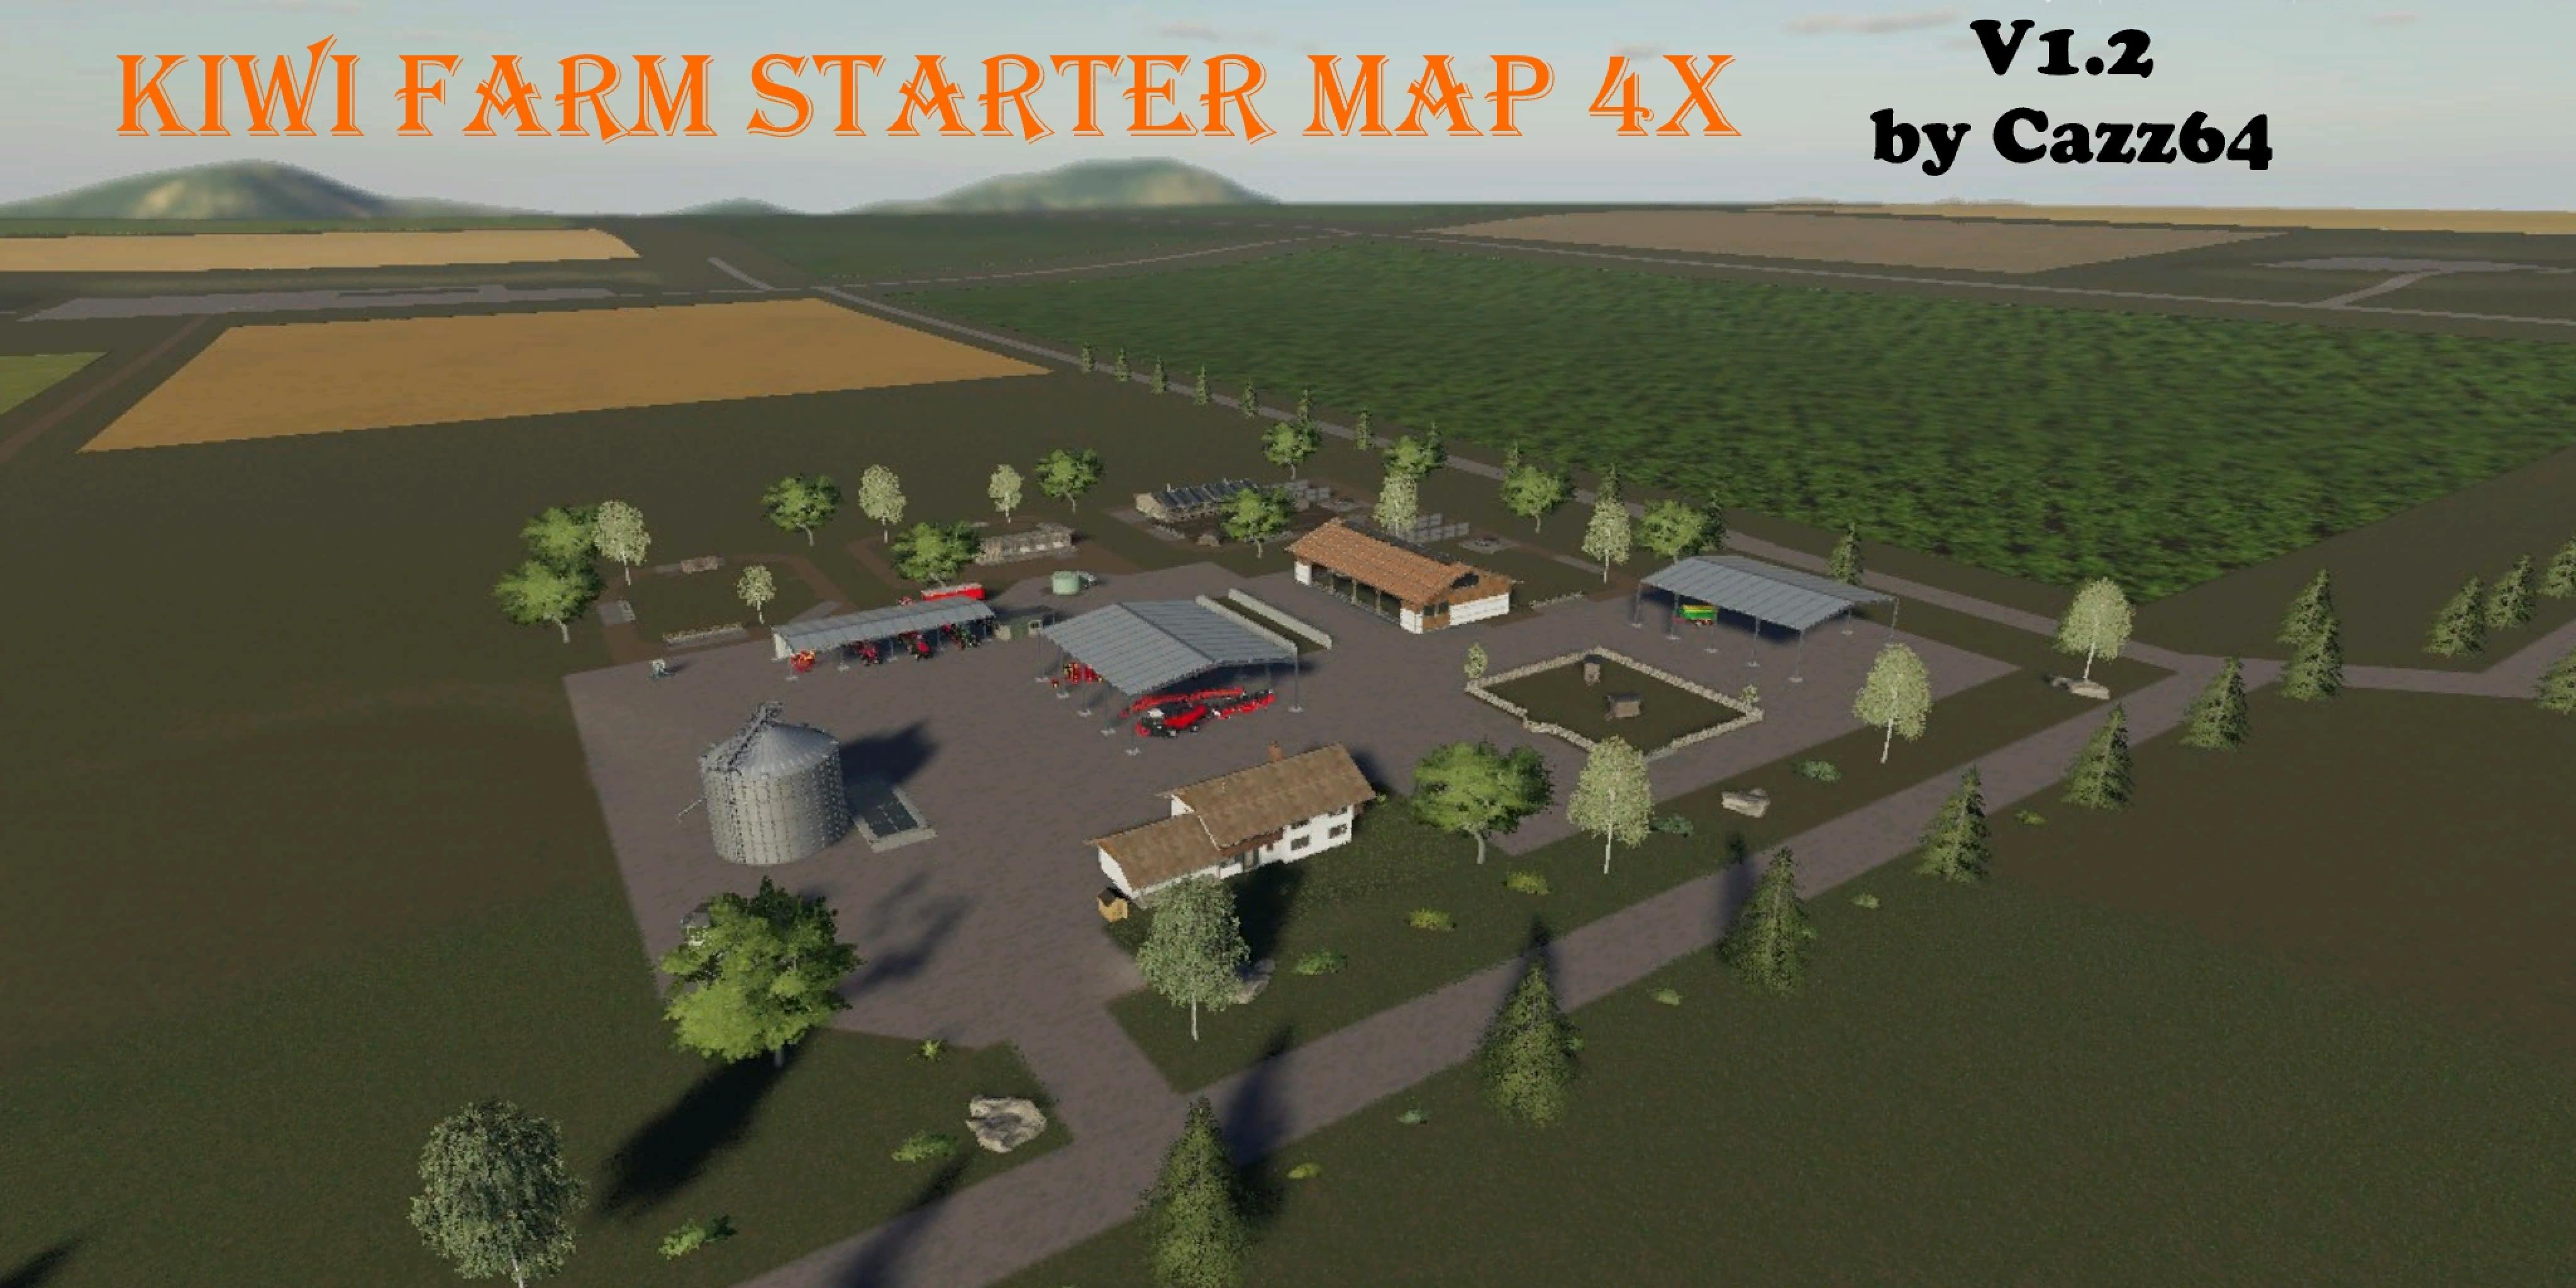 KIWI FARM STARTER MAP 4X v1 2 Map - Farming Simulator 2017 mod, LS